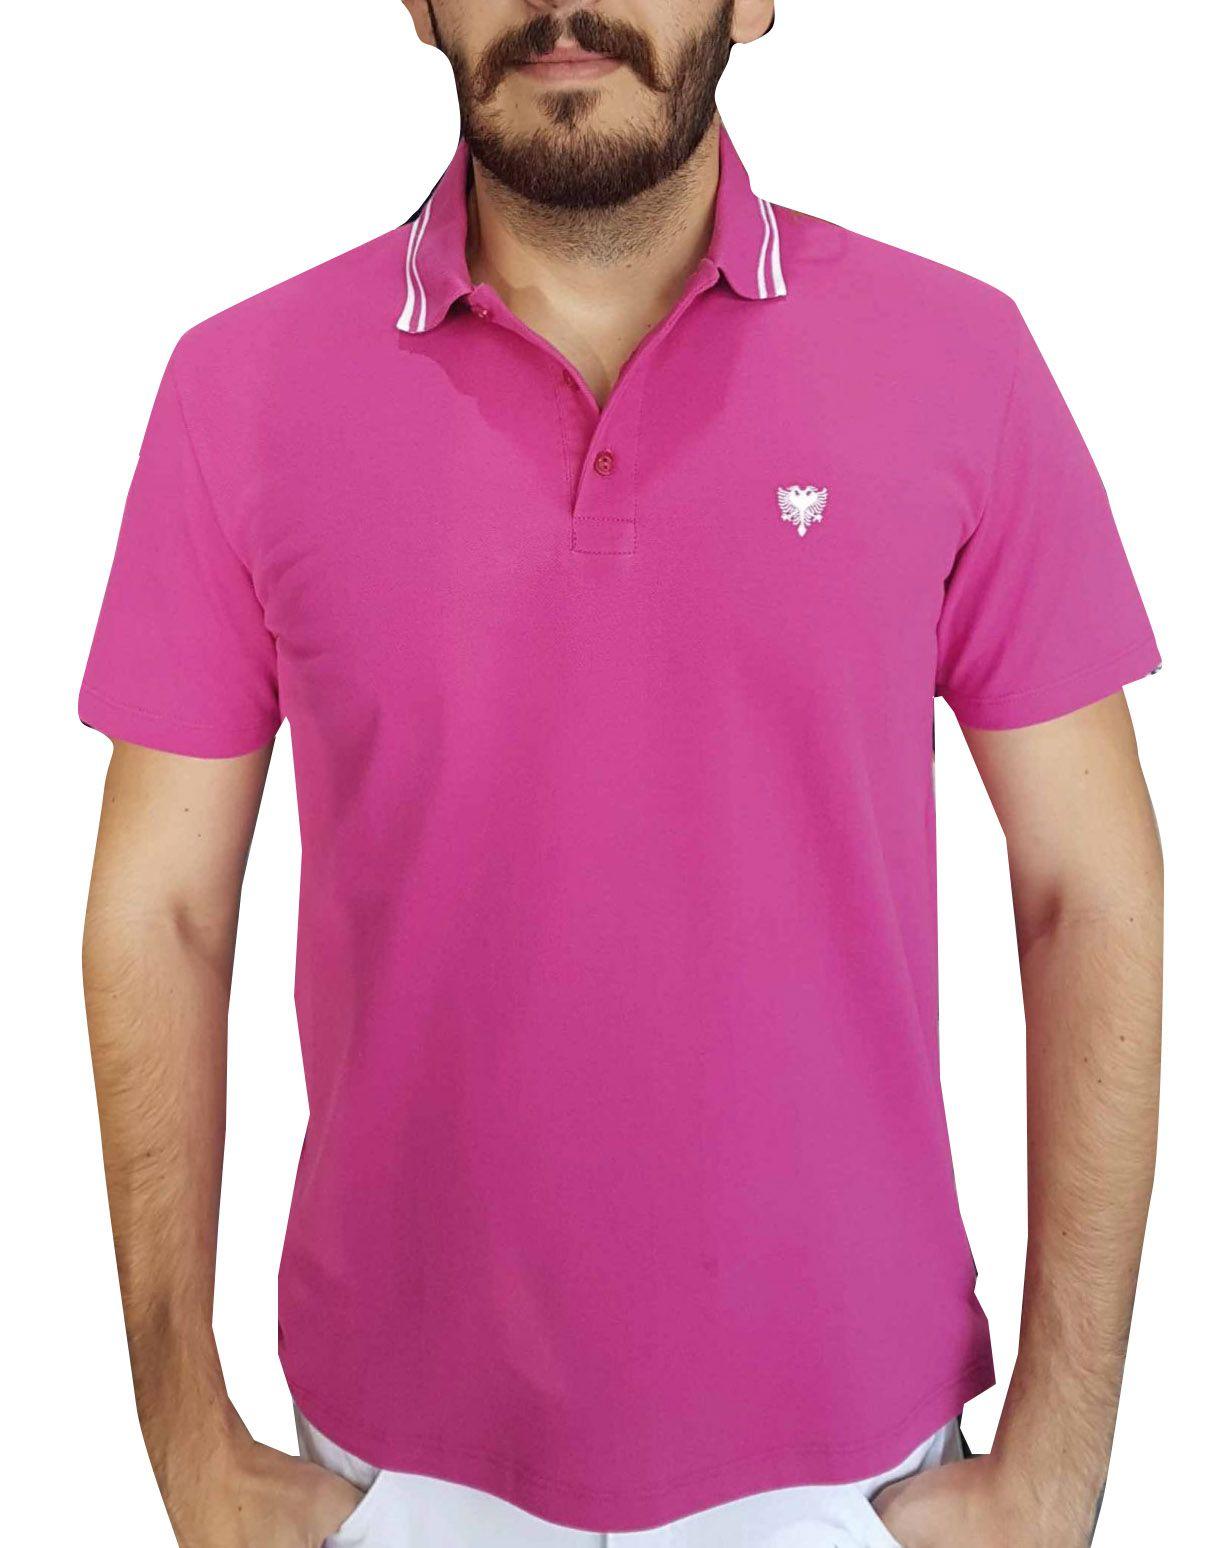 Camiseta Cavalera Masculina Rosa Polo Piquet